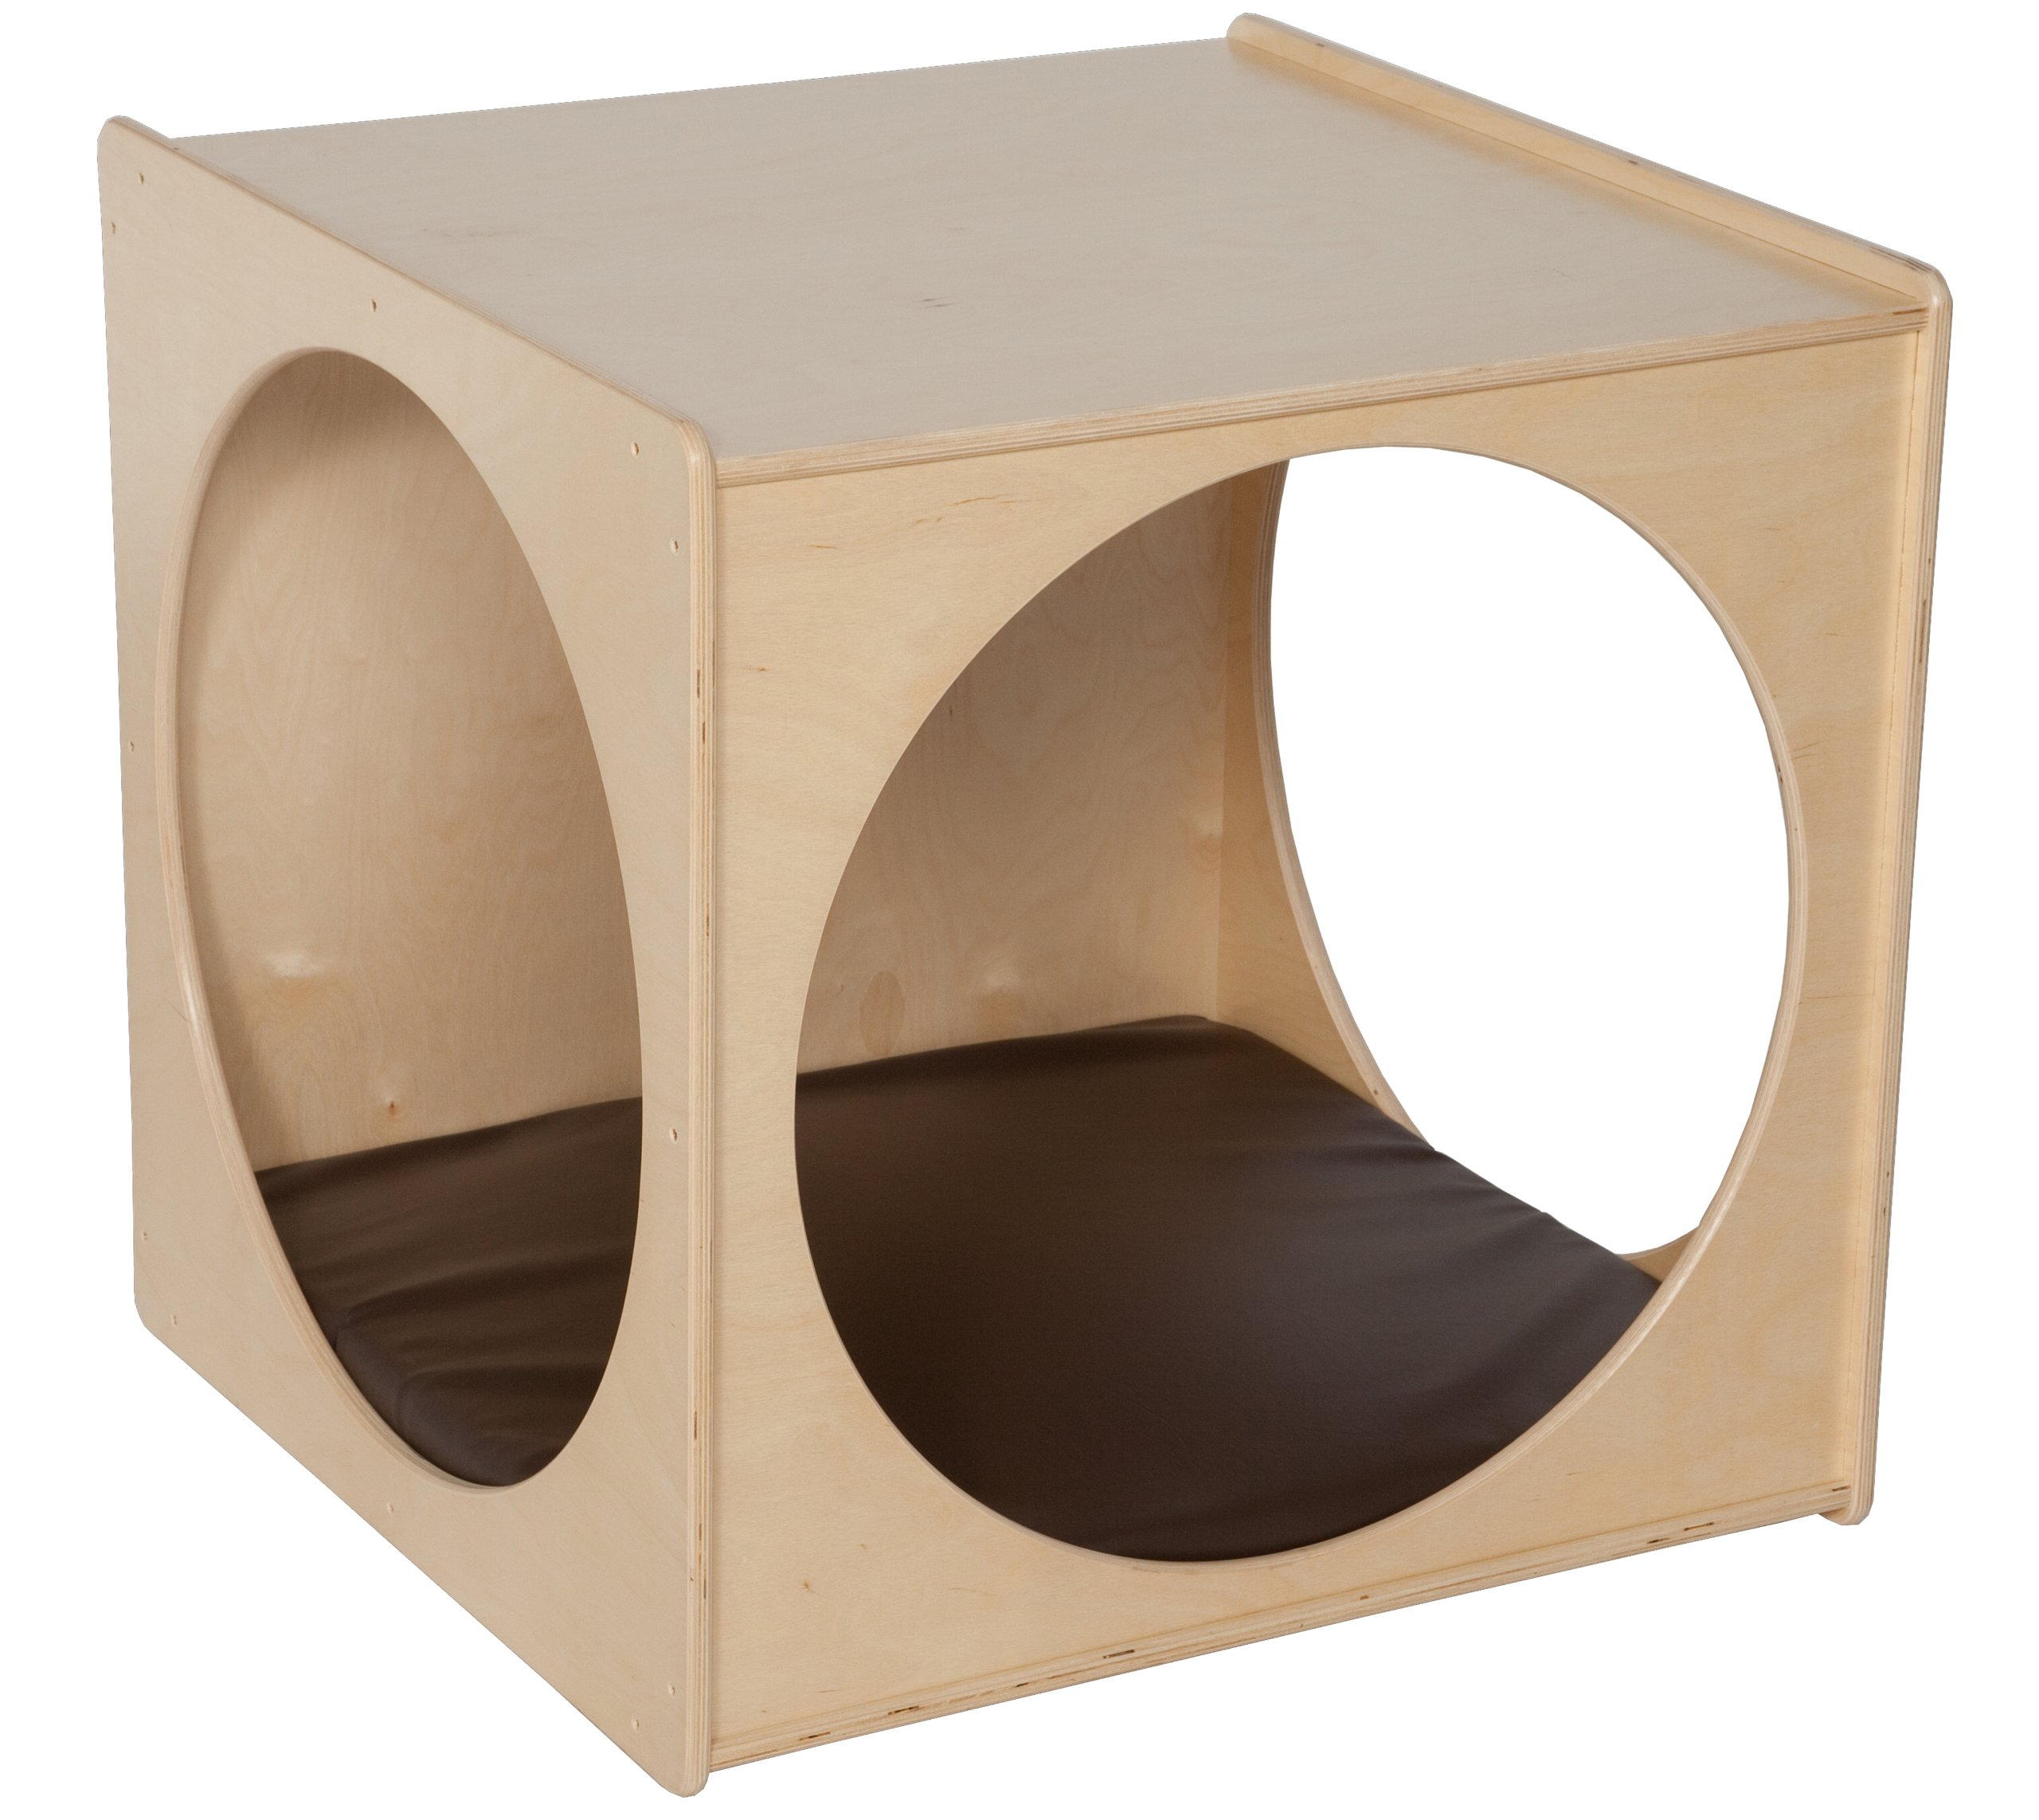 Natural Environments C29029BN Giant Crawl Thru Play Cube (Imagination Cube) w/Brown Cushion